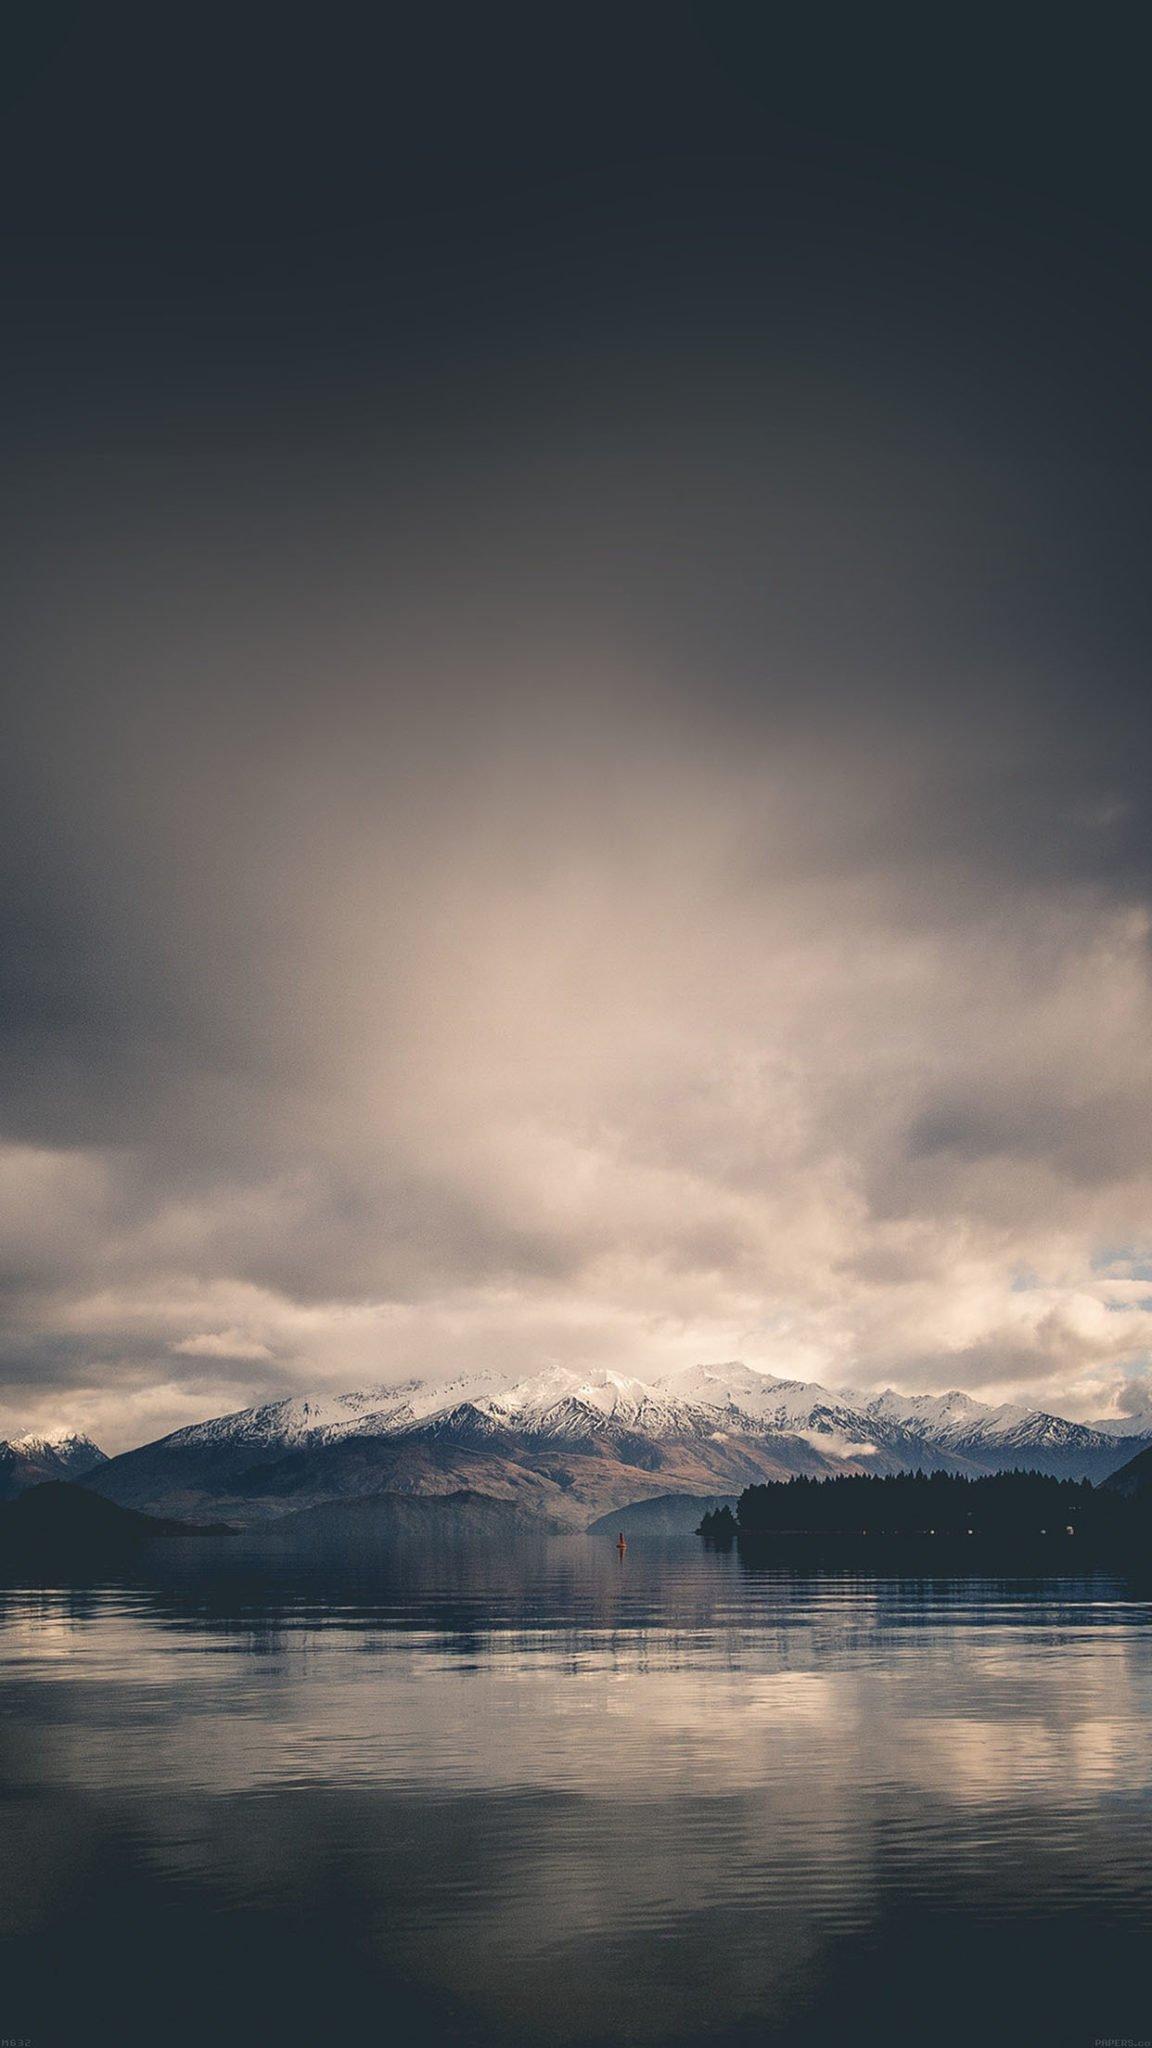 Aesthetic Background Landscape Hd